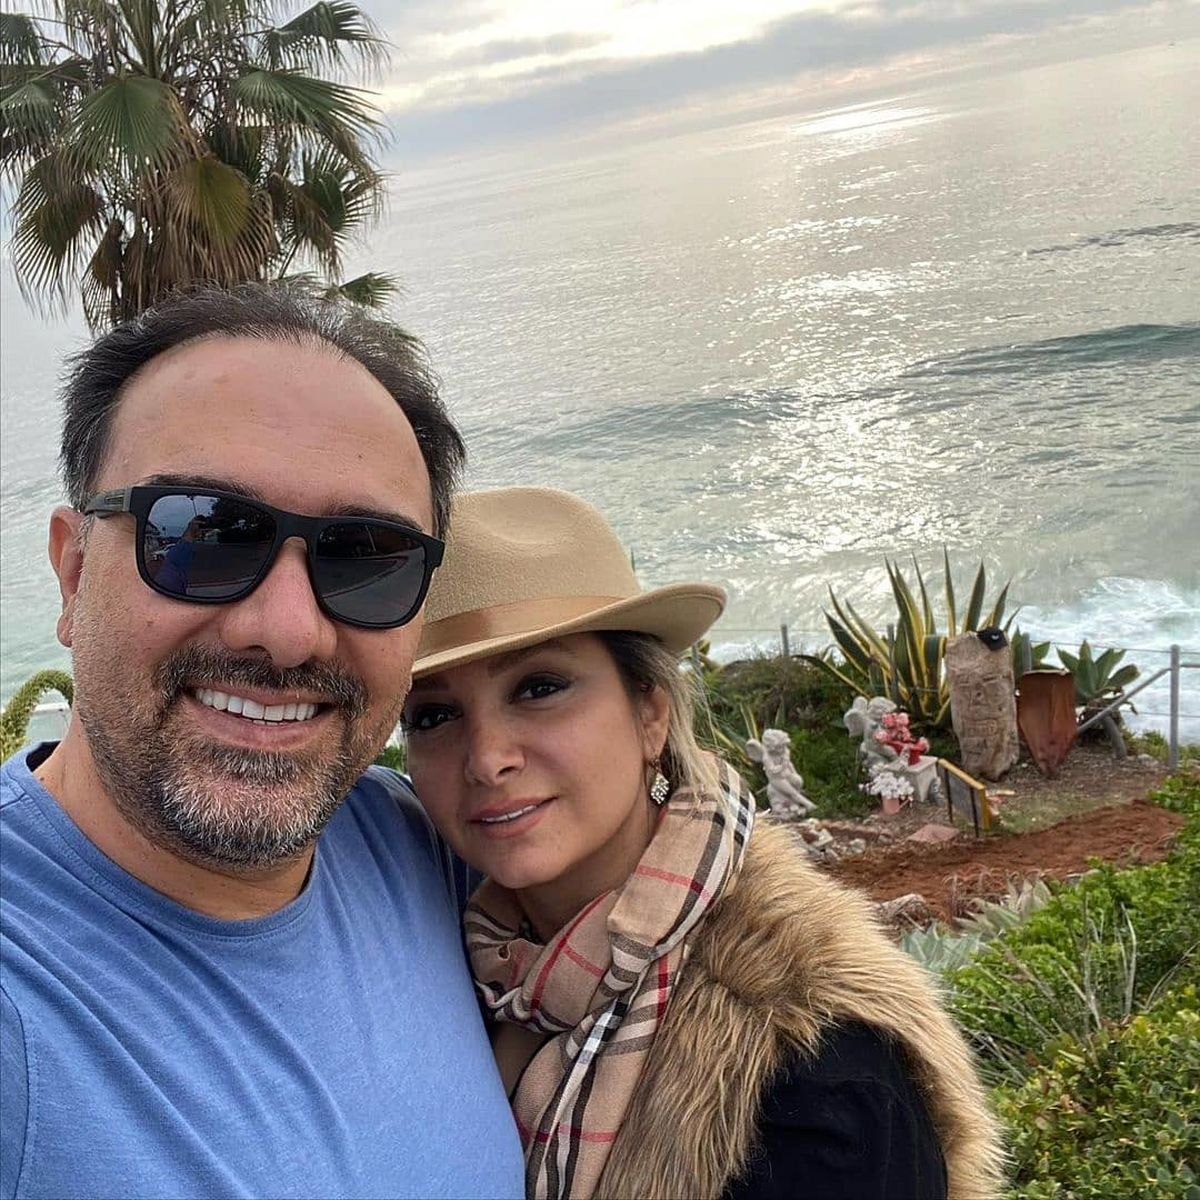 عکس عاشقانه برزو ارجمند و همسر بی حجابش